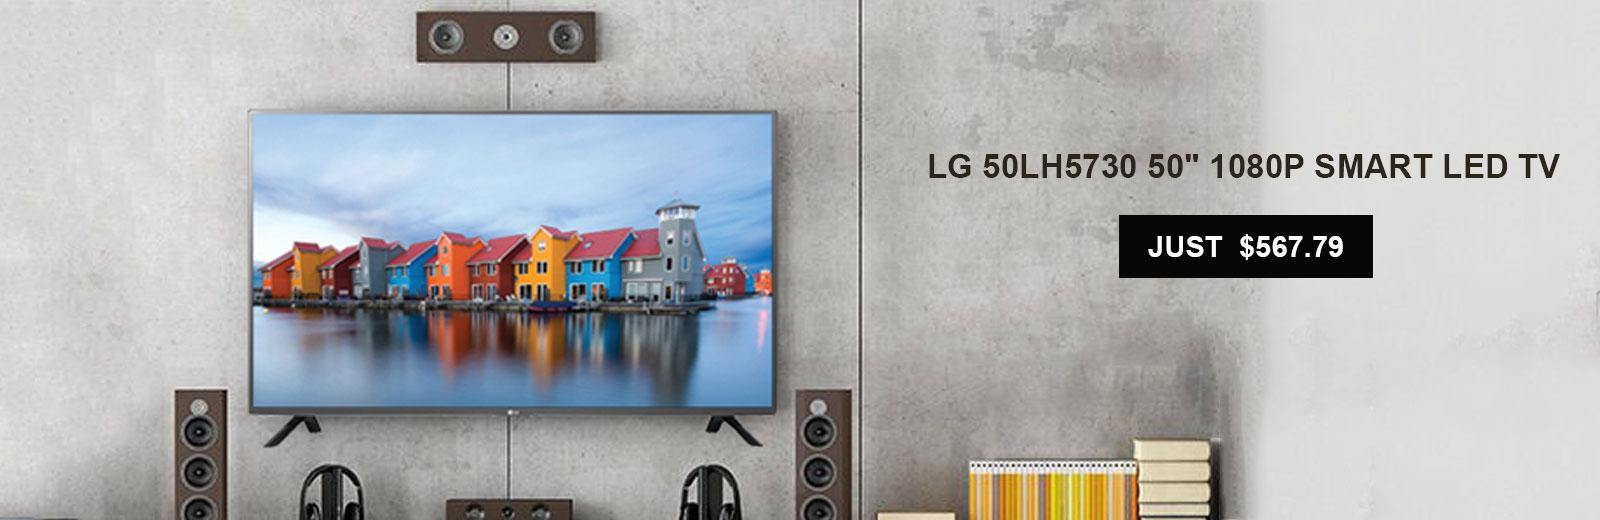 LG50LH57